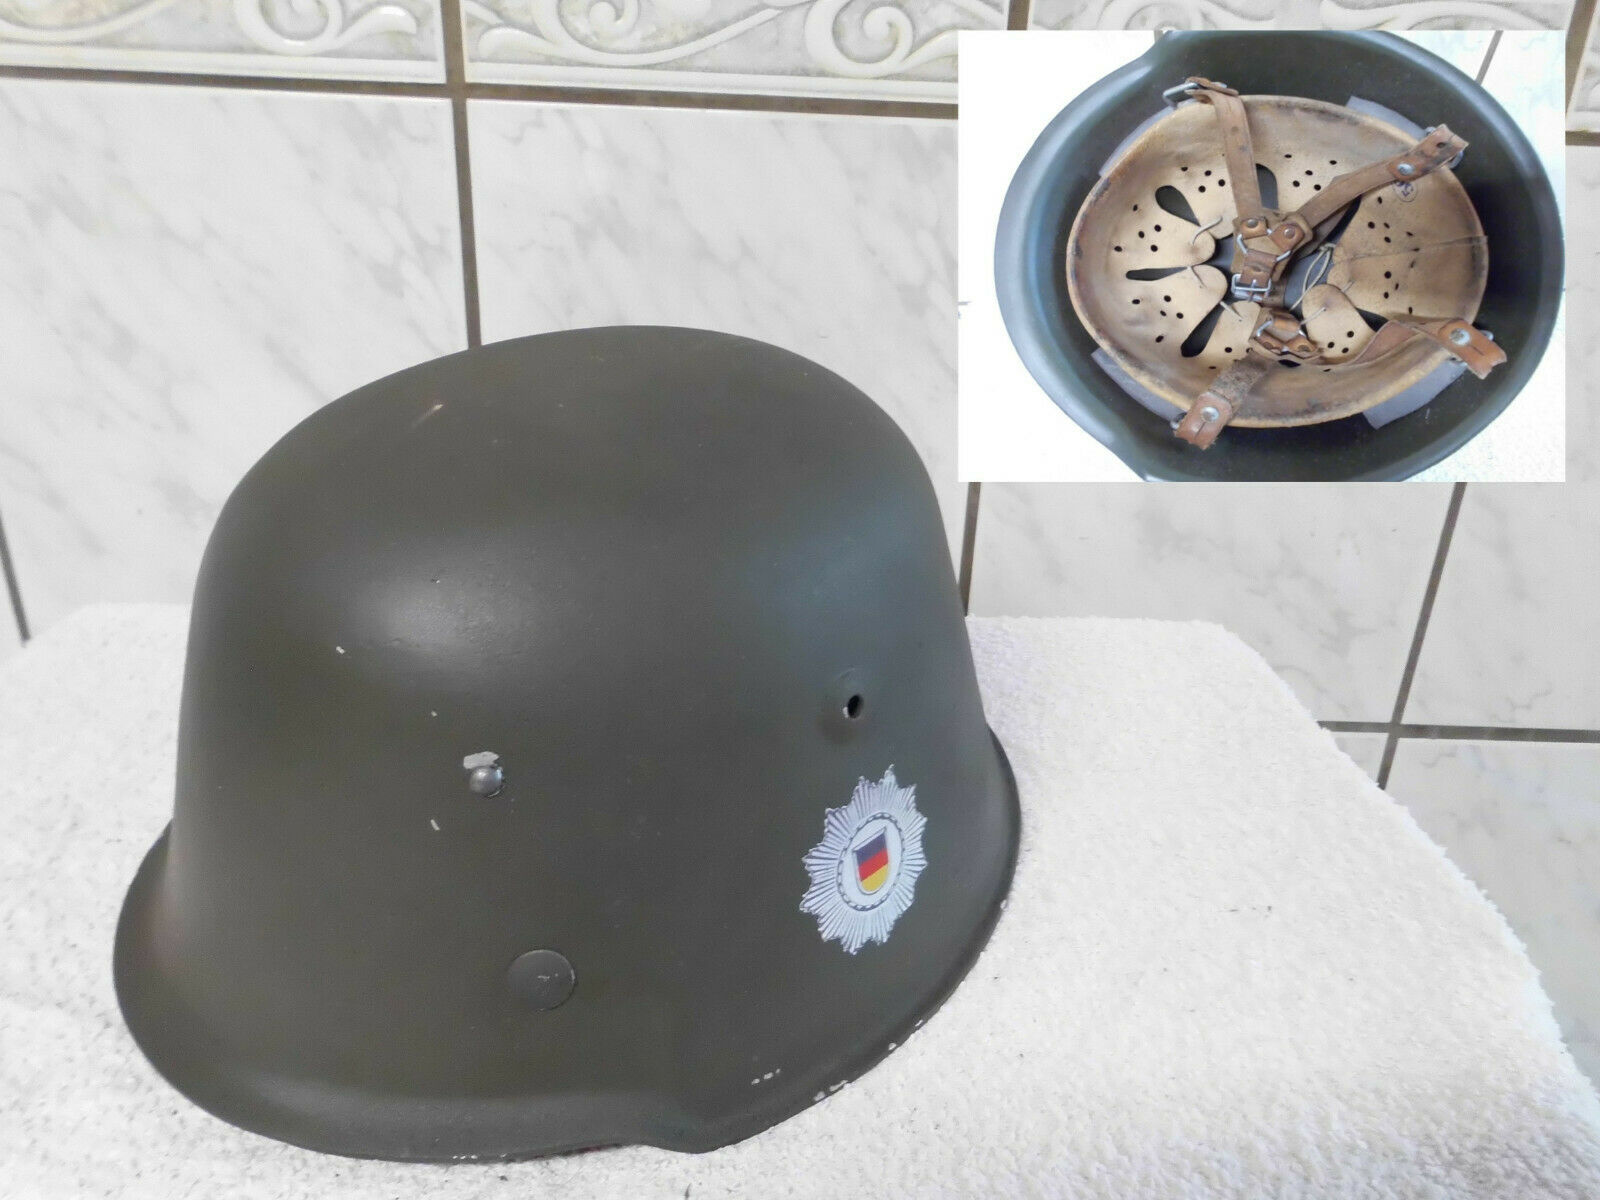 Bild 1 - DDR NVA KVP MDI M54 Kesslerbombe Helm als Sammleranfertigung k. Stahlhelm Unikat